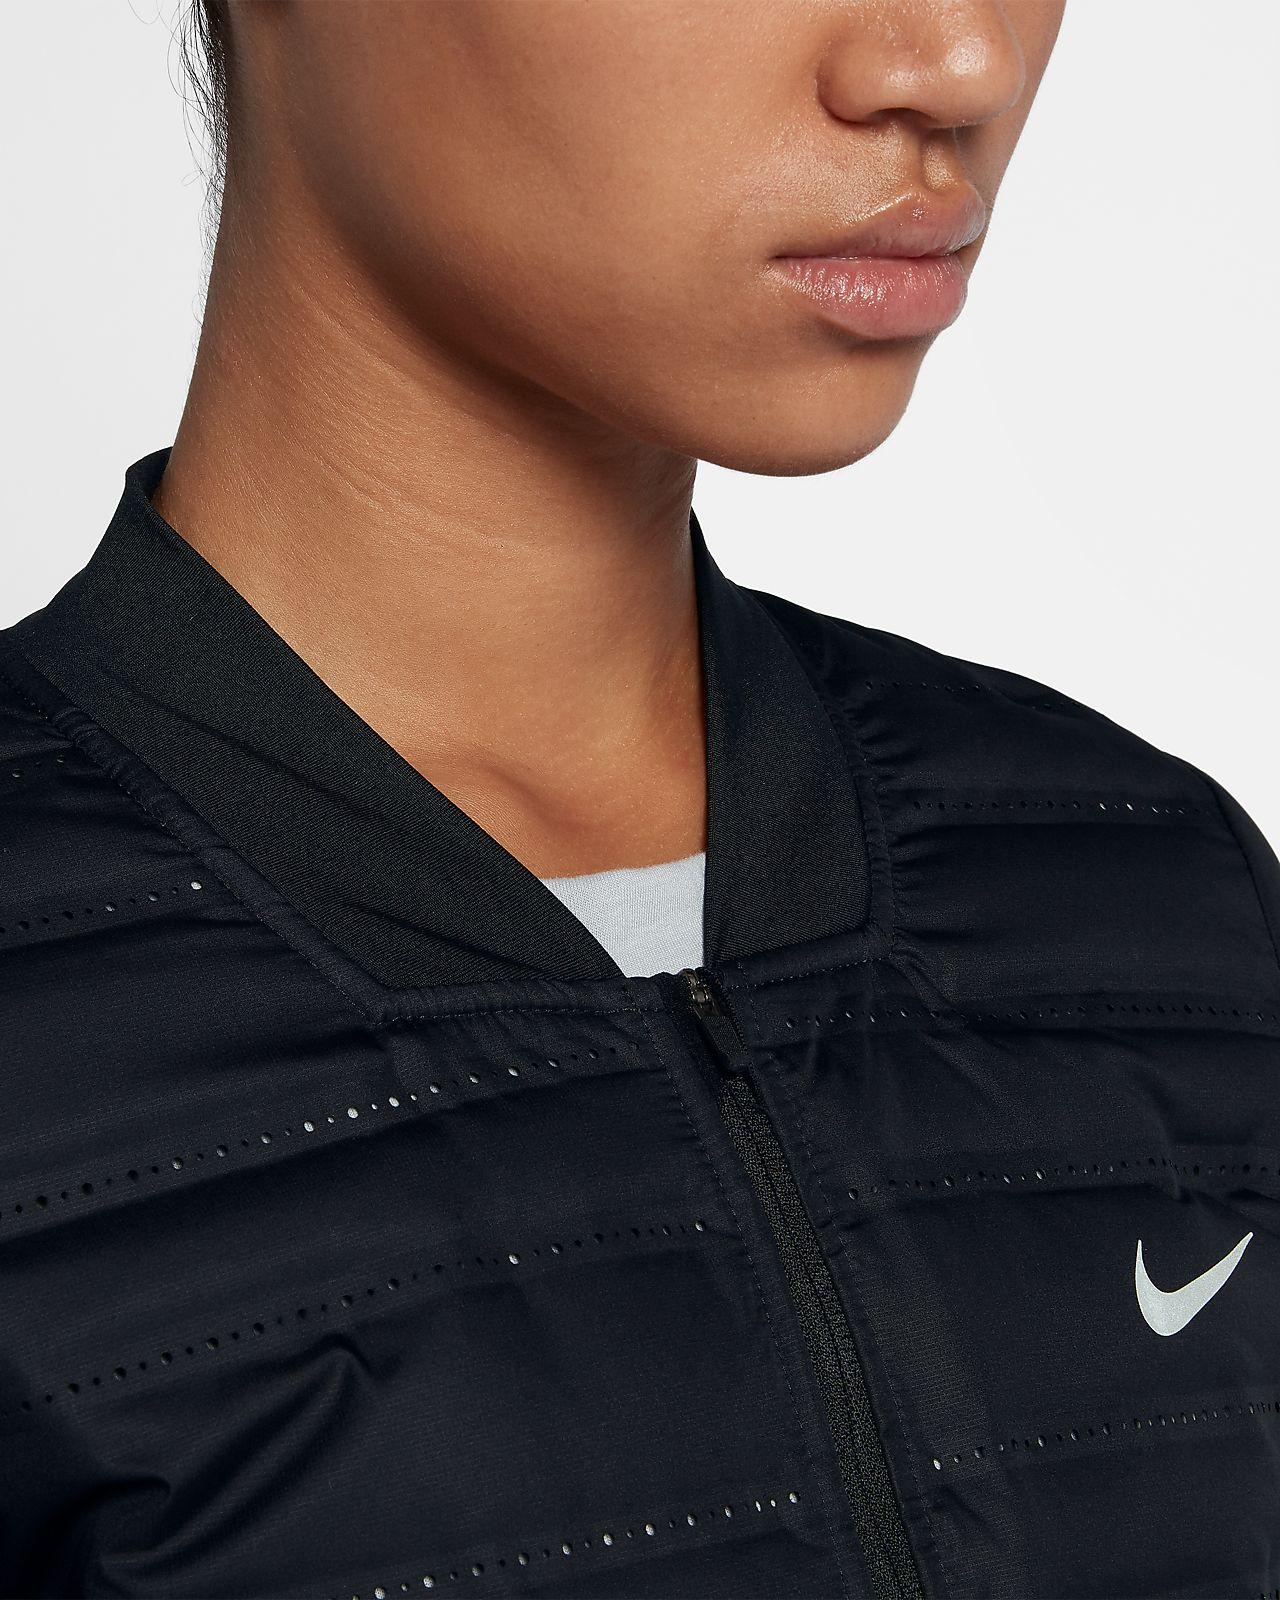 Low Resolution Nike AeroLoft Women's Running Jacket Nike AeroLoft Women's  Running Jacket